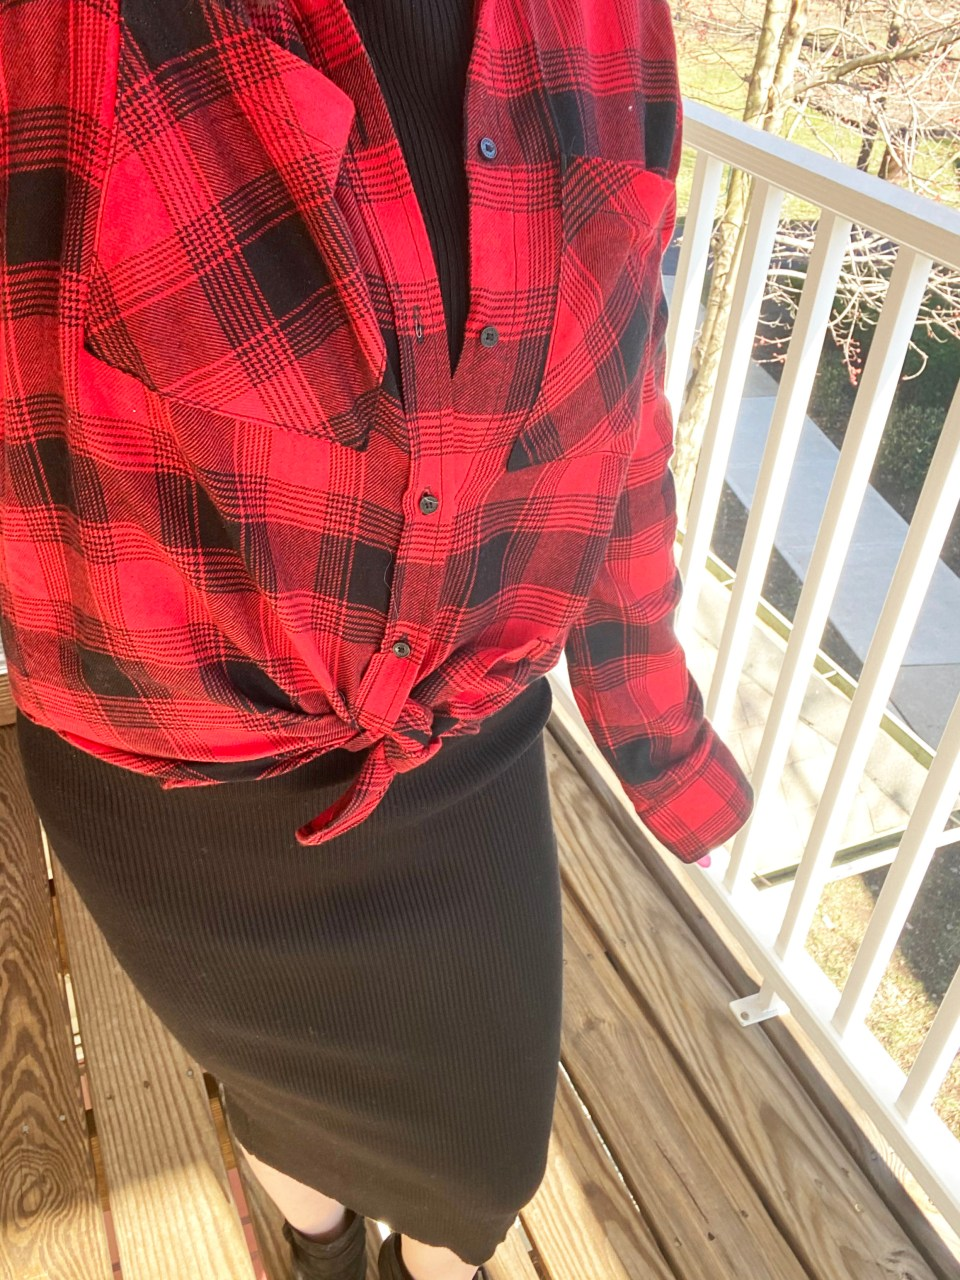 Turtleneck Ribbed Dress + Plaid Shirt 13